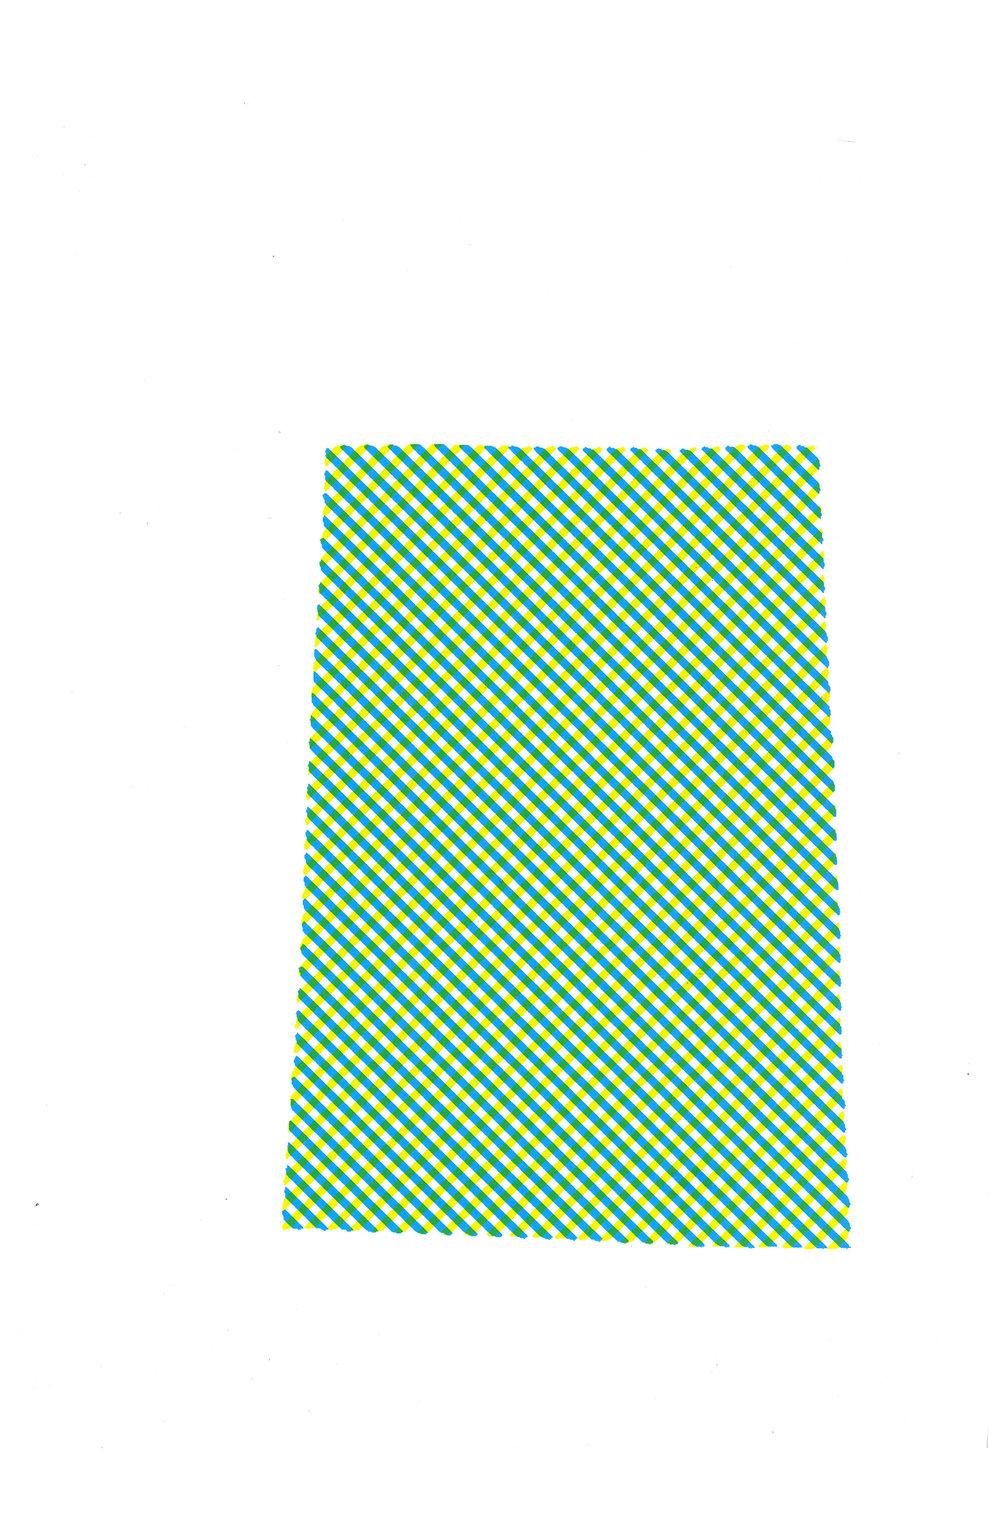 Trapezoid_cy_72.jpg